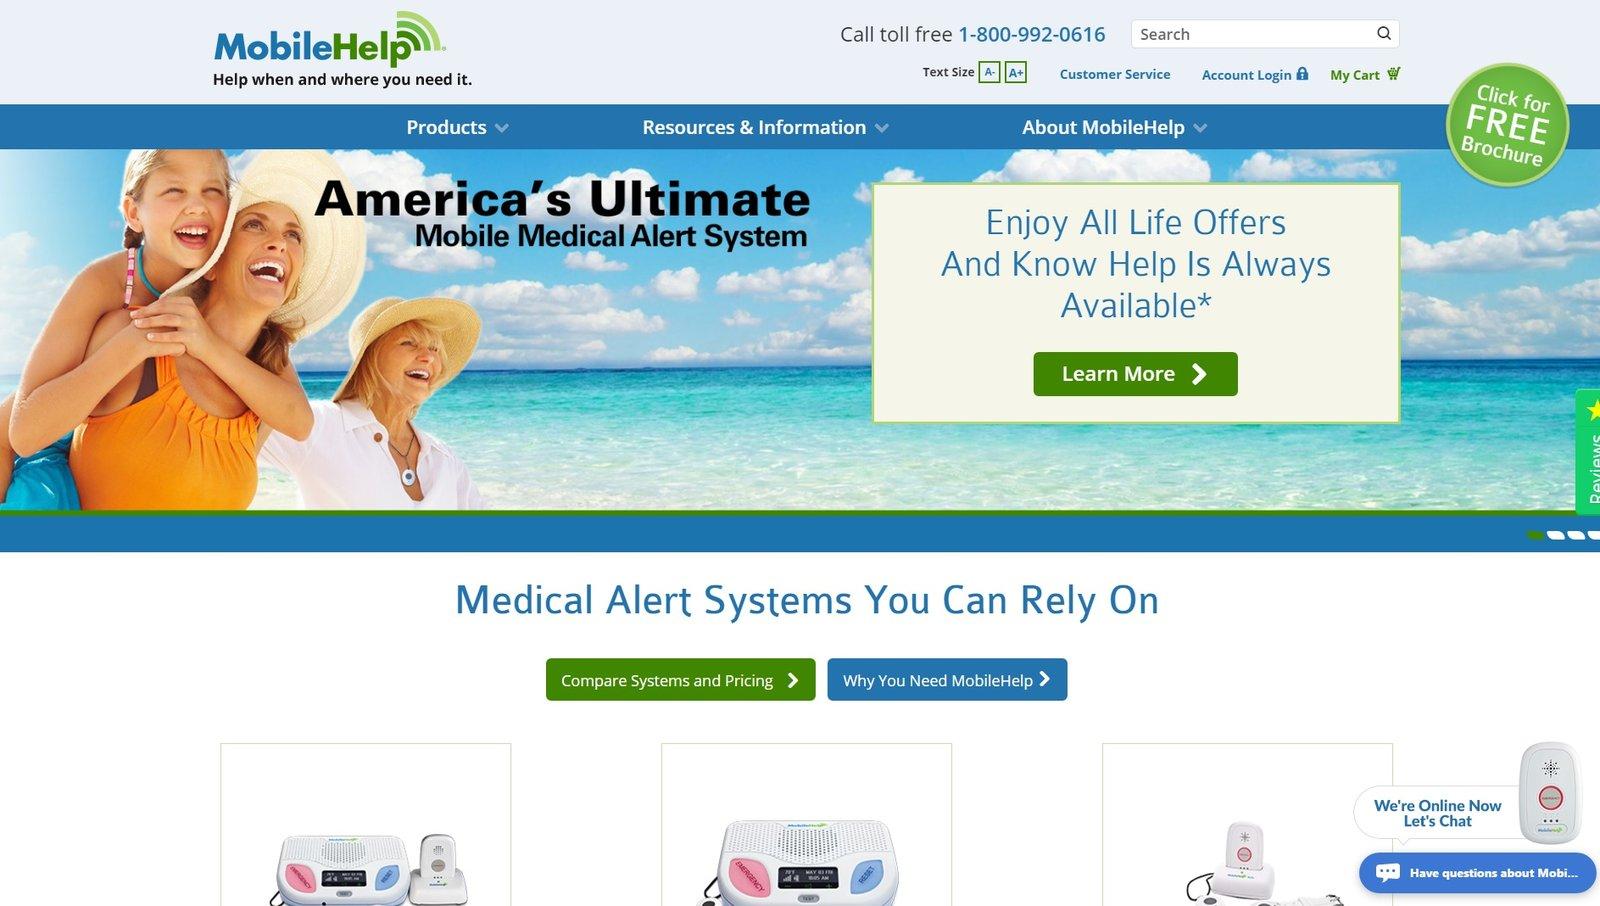 web design of MobileHelp